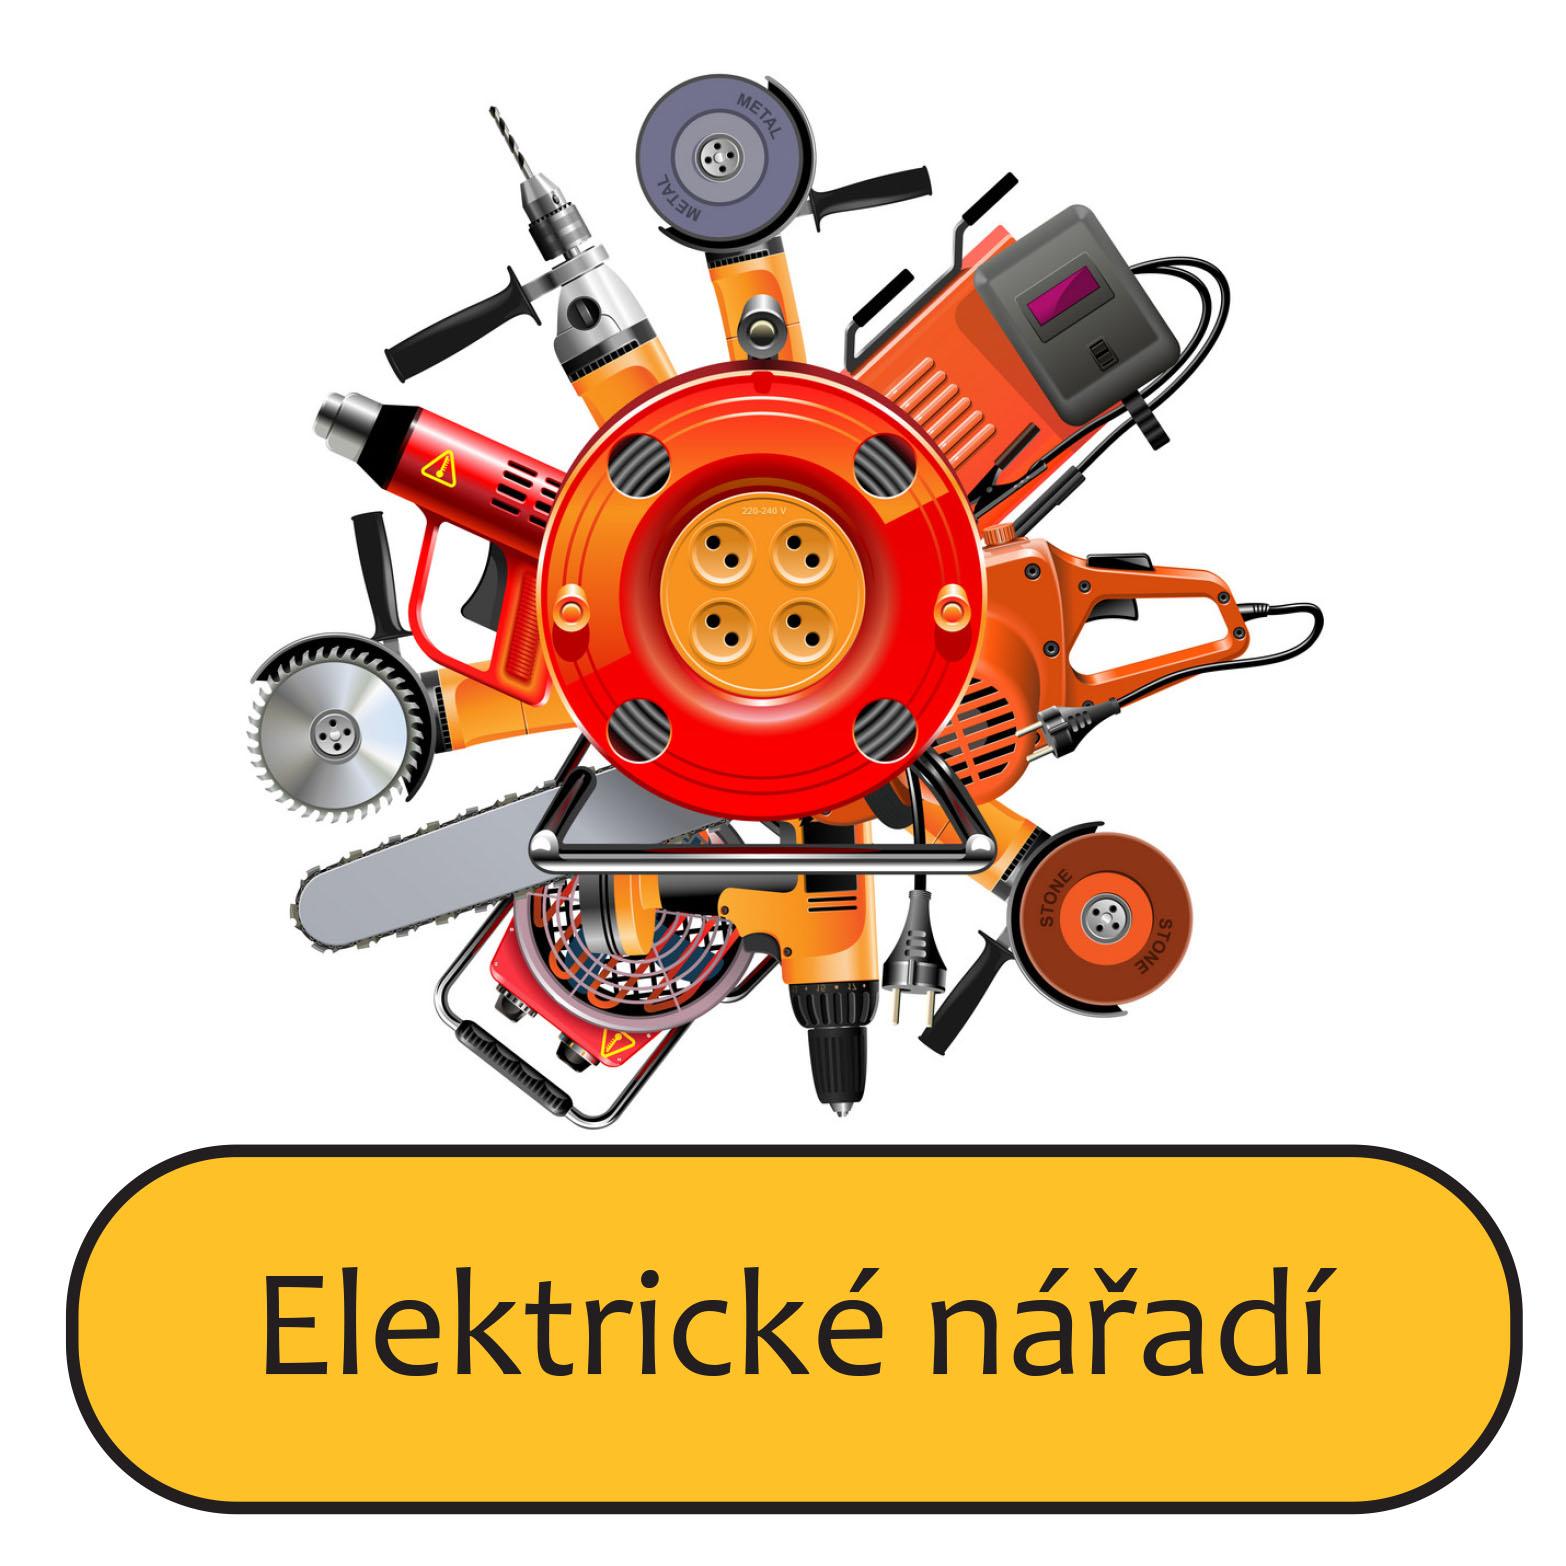 Elektrické nářadí